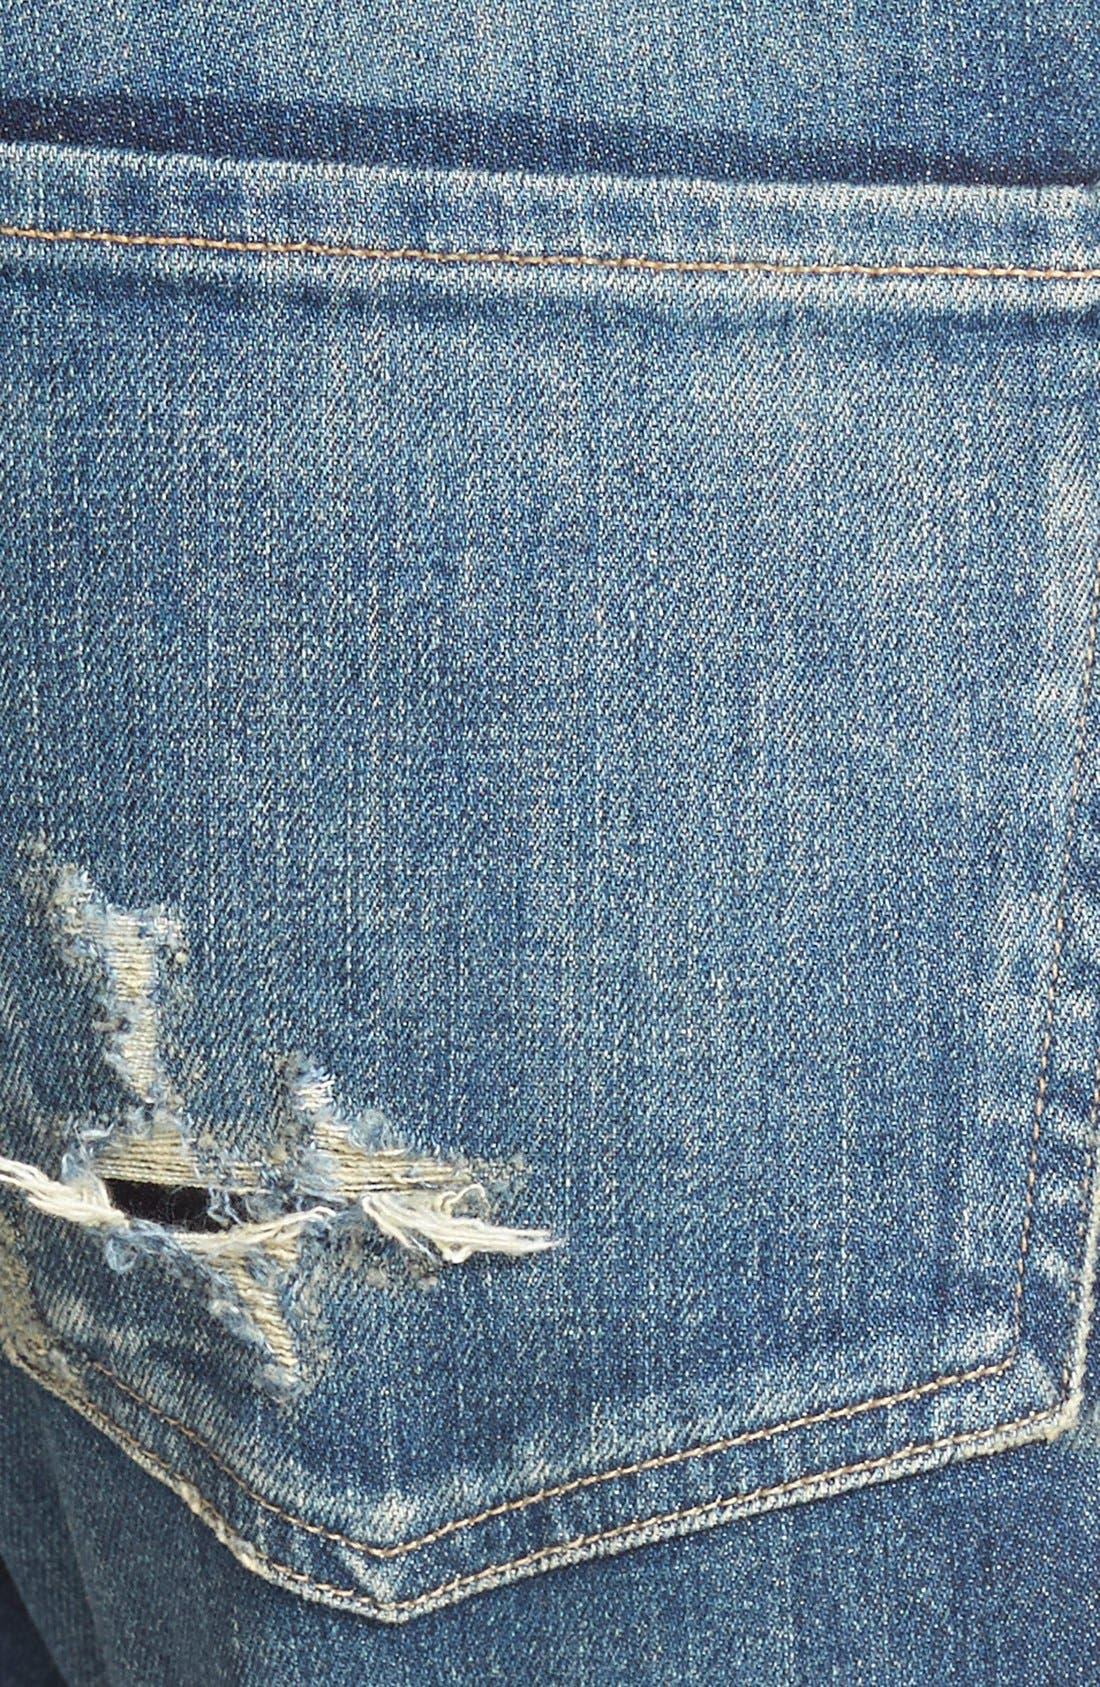 'Corey' Slouchy Slim Jeans,                             Alternate thumbnail 3, color,                             Hayward